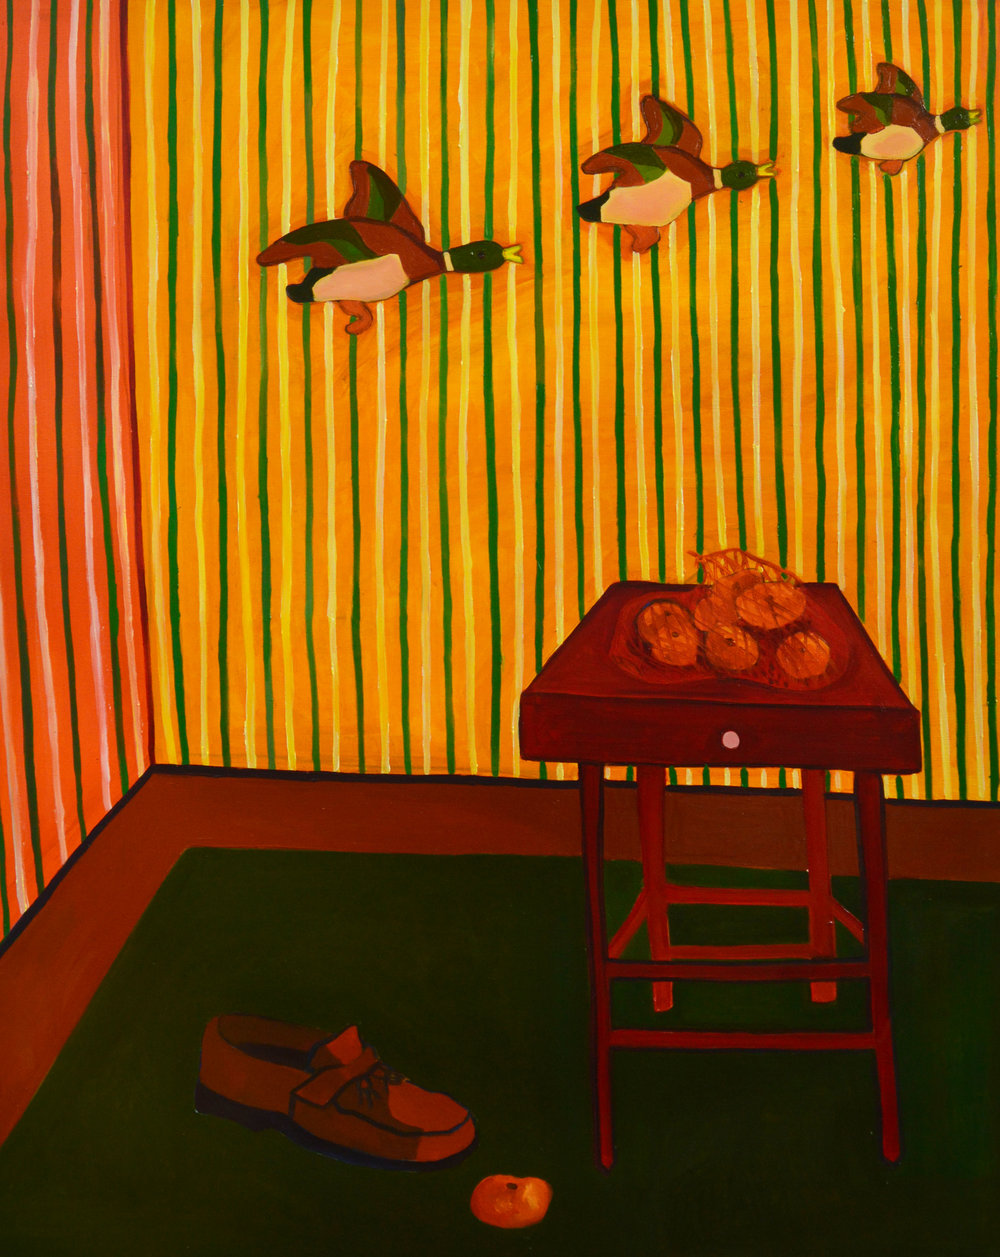 Ducks, Shoe, Tangerine